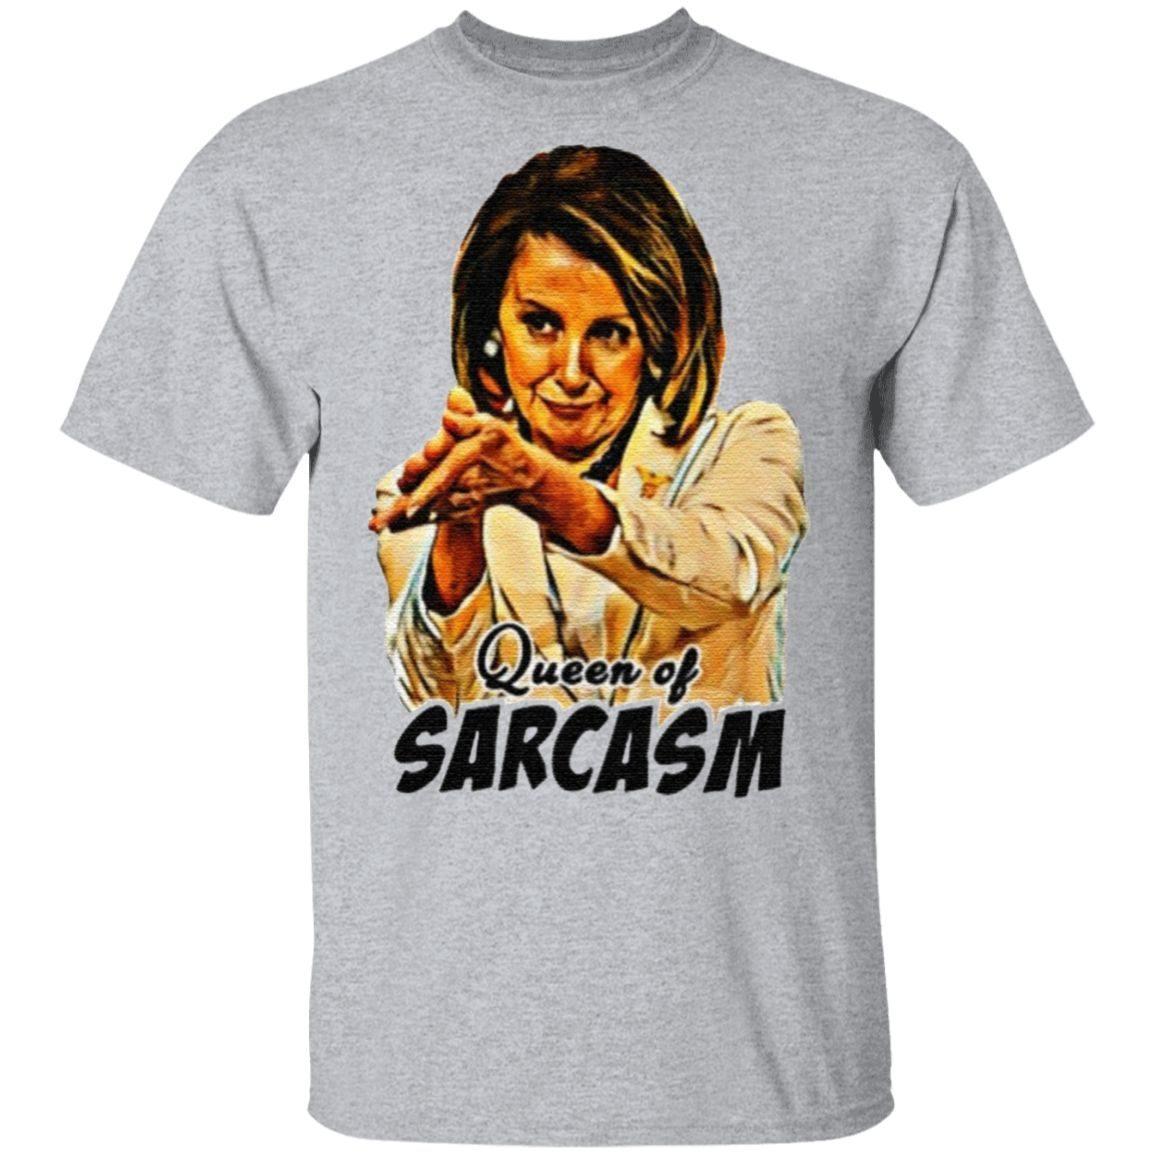 Queen of sarcasm t shirt